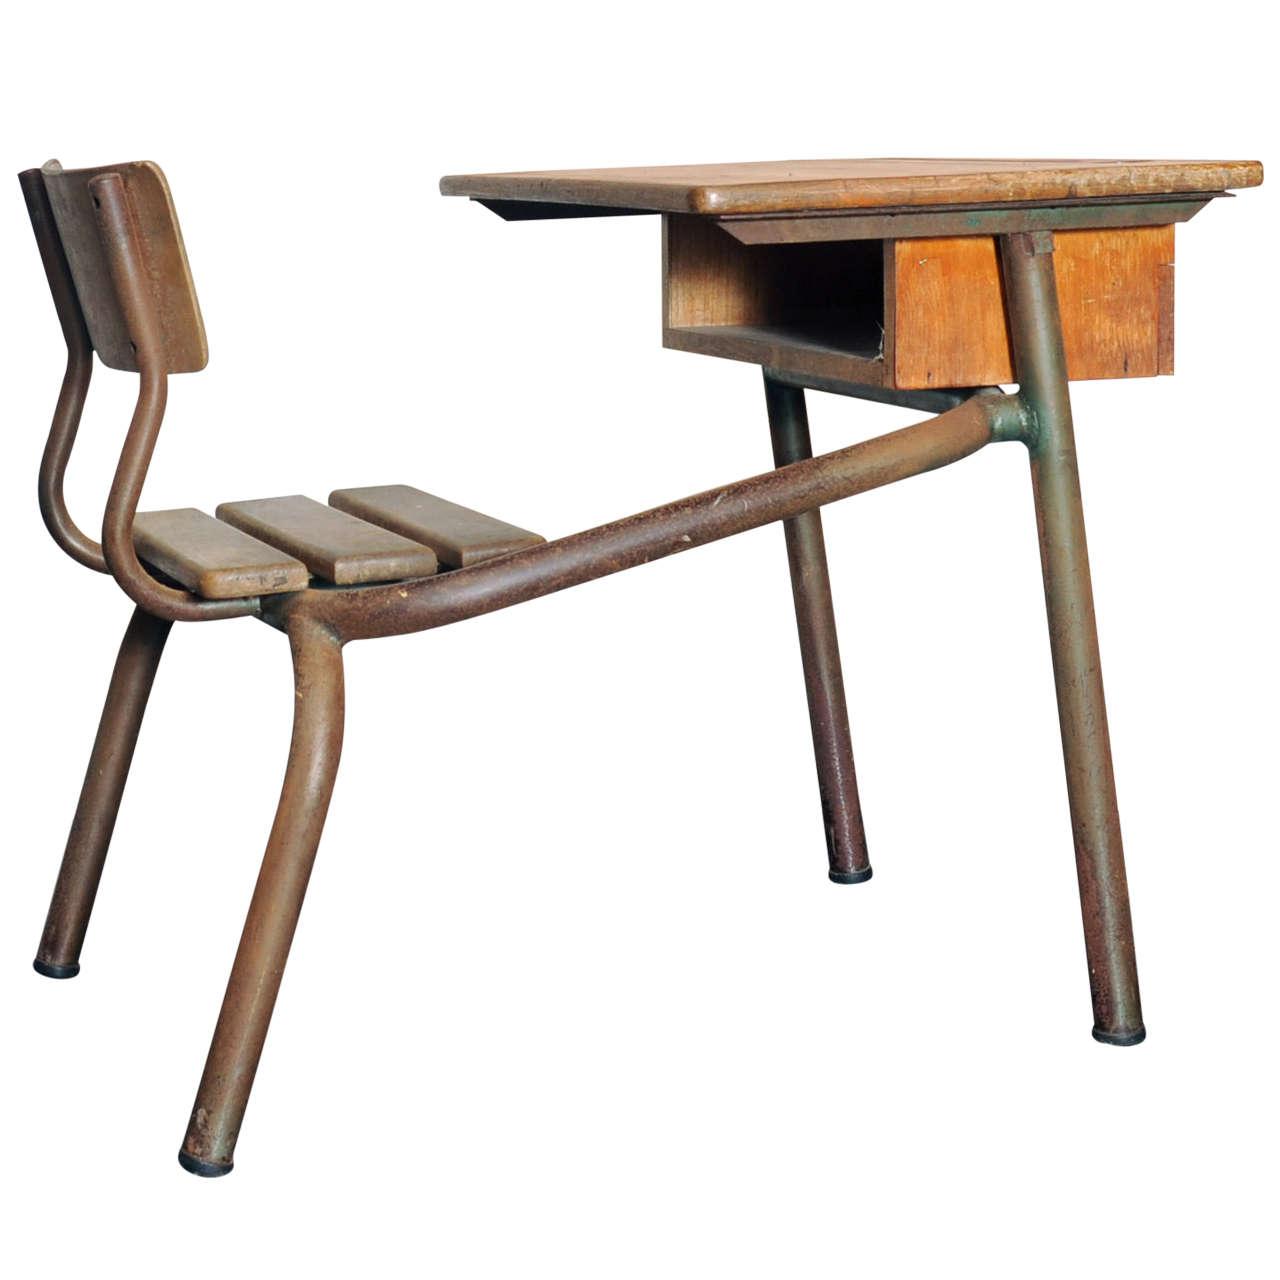 Desk Bureau Dcole Possibly Jean Prouv For Sale at 1stdibs